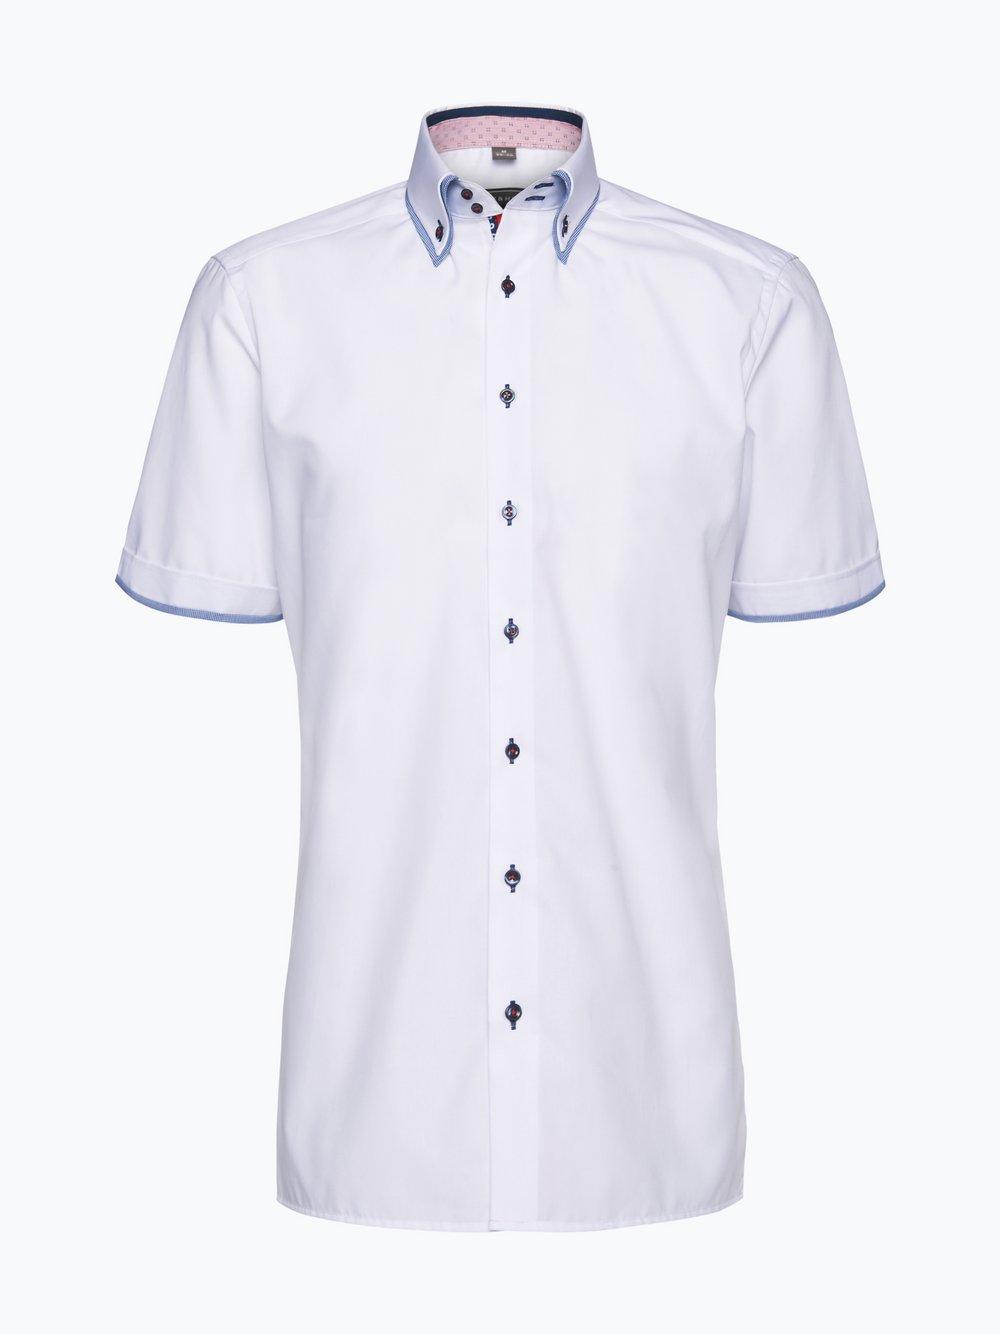 finshley \u0026 harding herren hemd luxury online kaufen peek und  finshley \u0026 harding herren hemd luxury 0